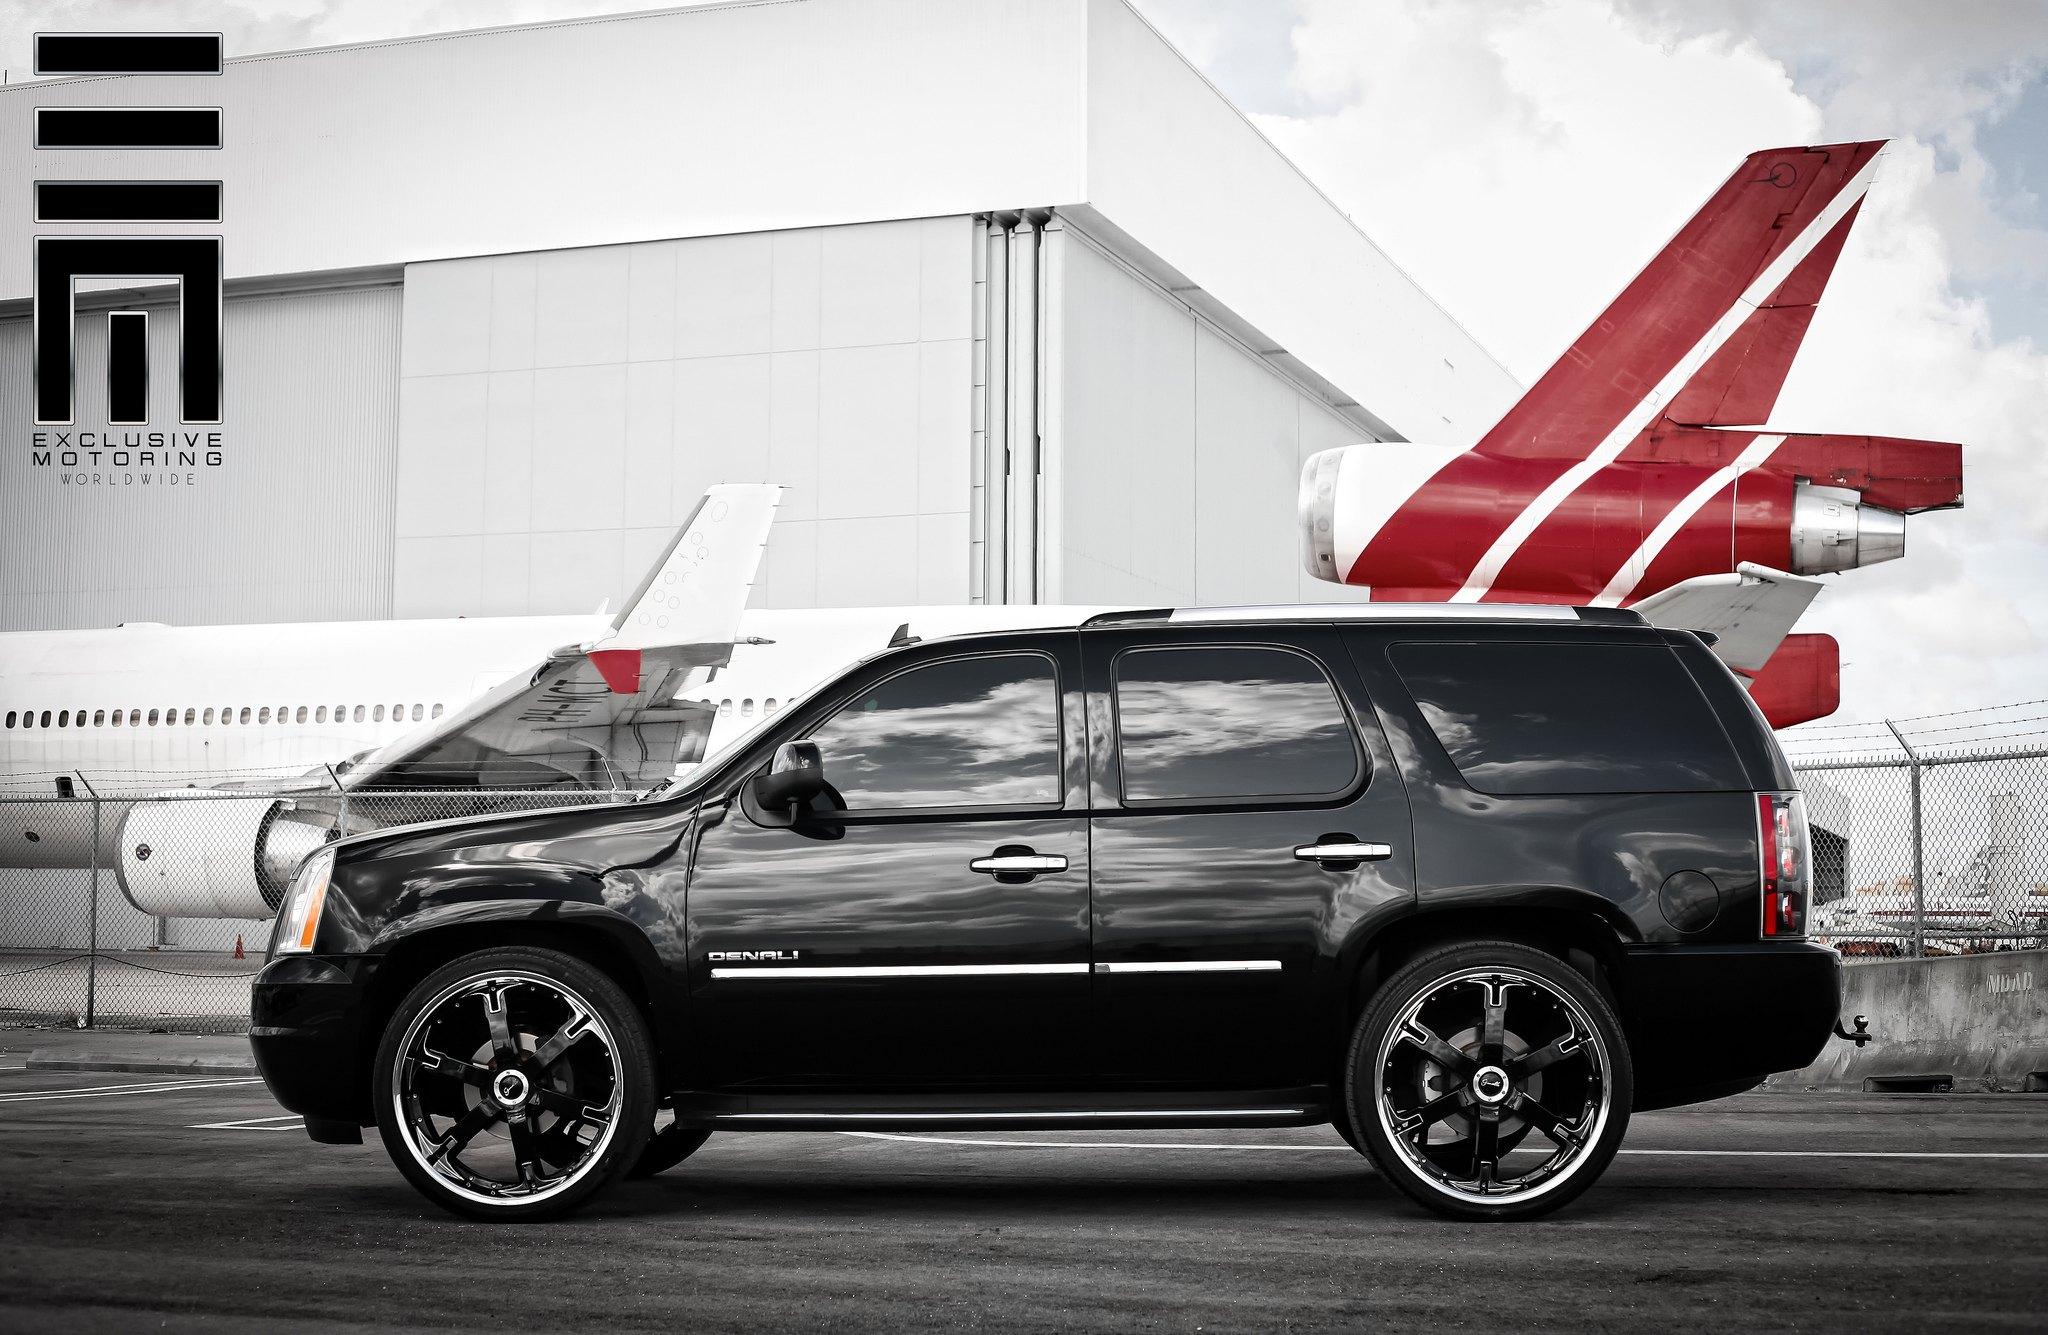 Gmc Yukon Denali On Black Custom Wheels By Exclusive Motoring